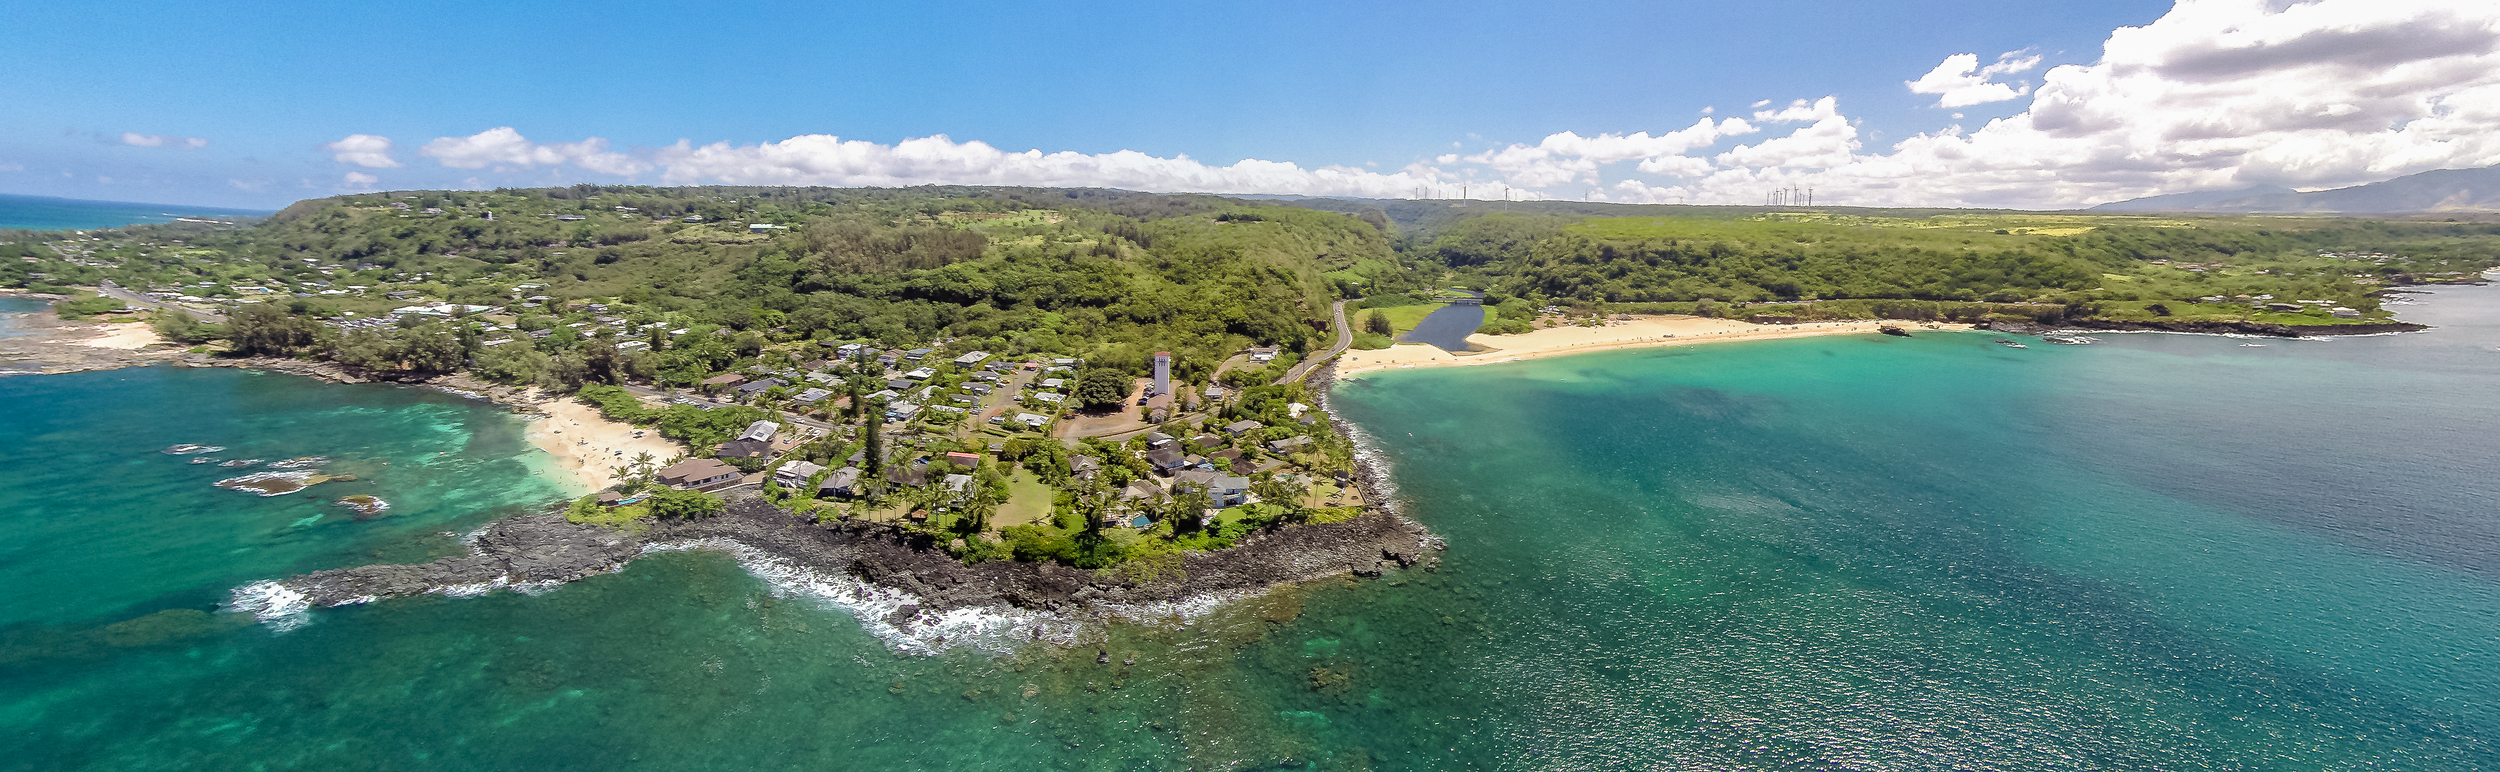 Waimea Point Residence - North Shore